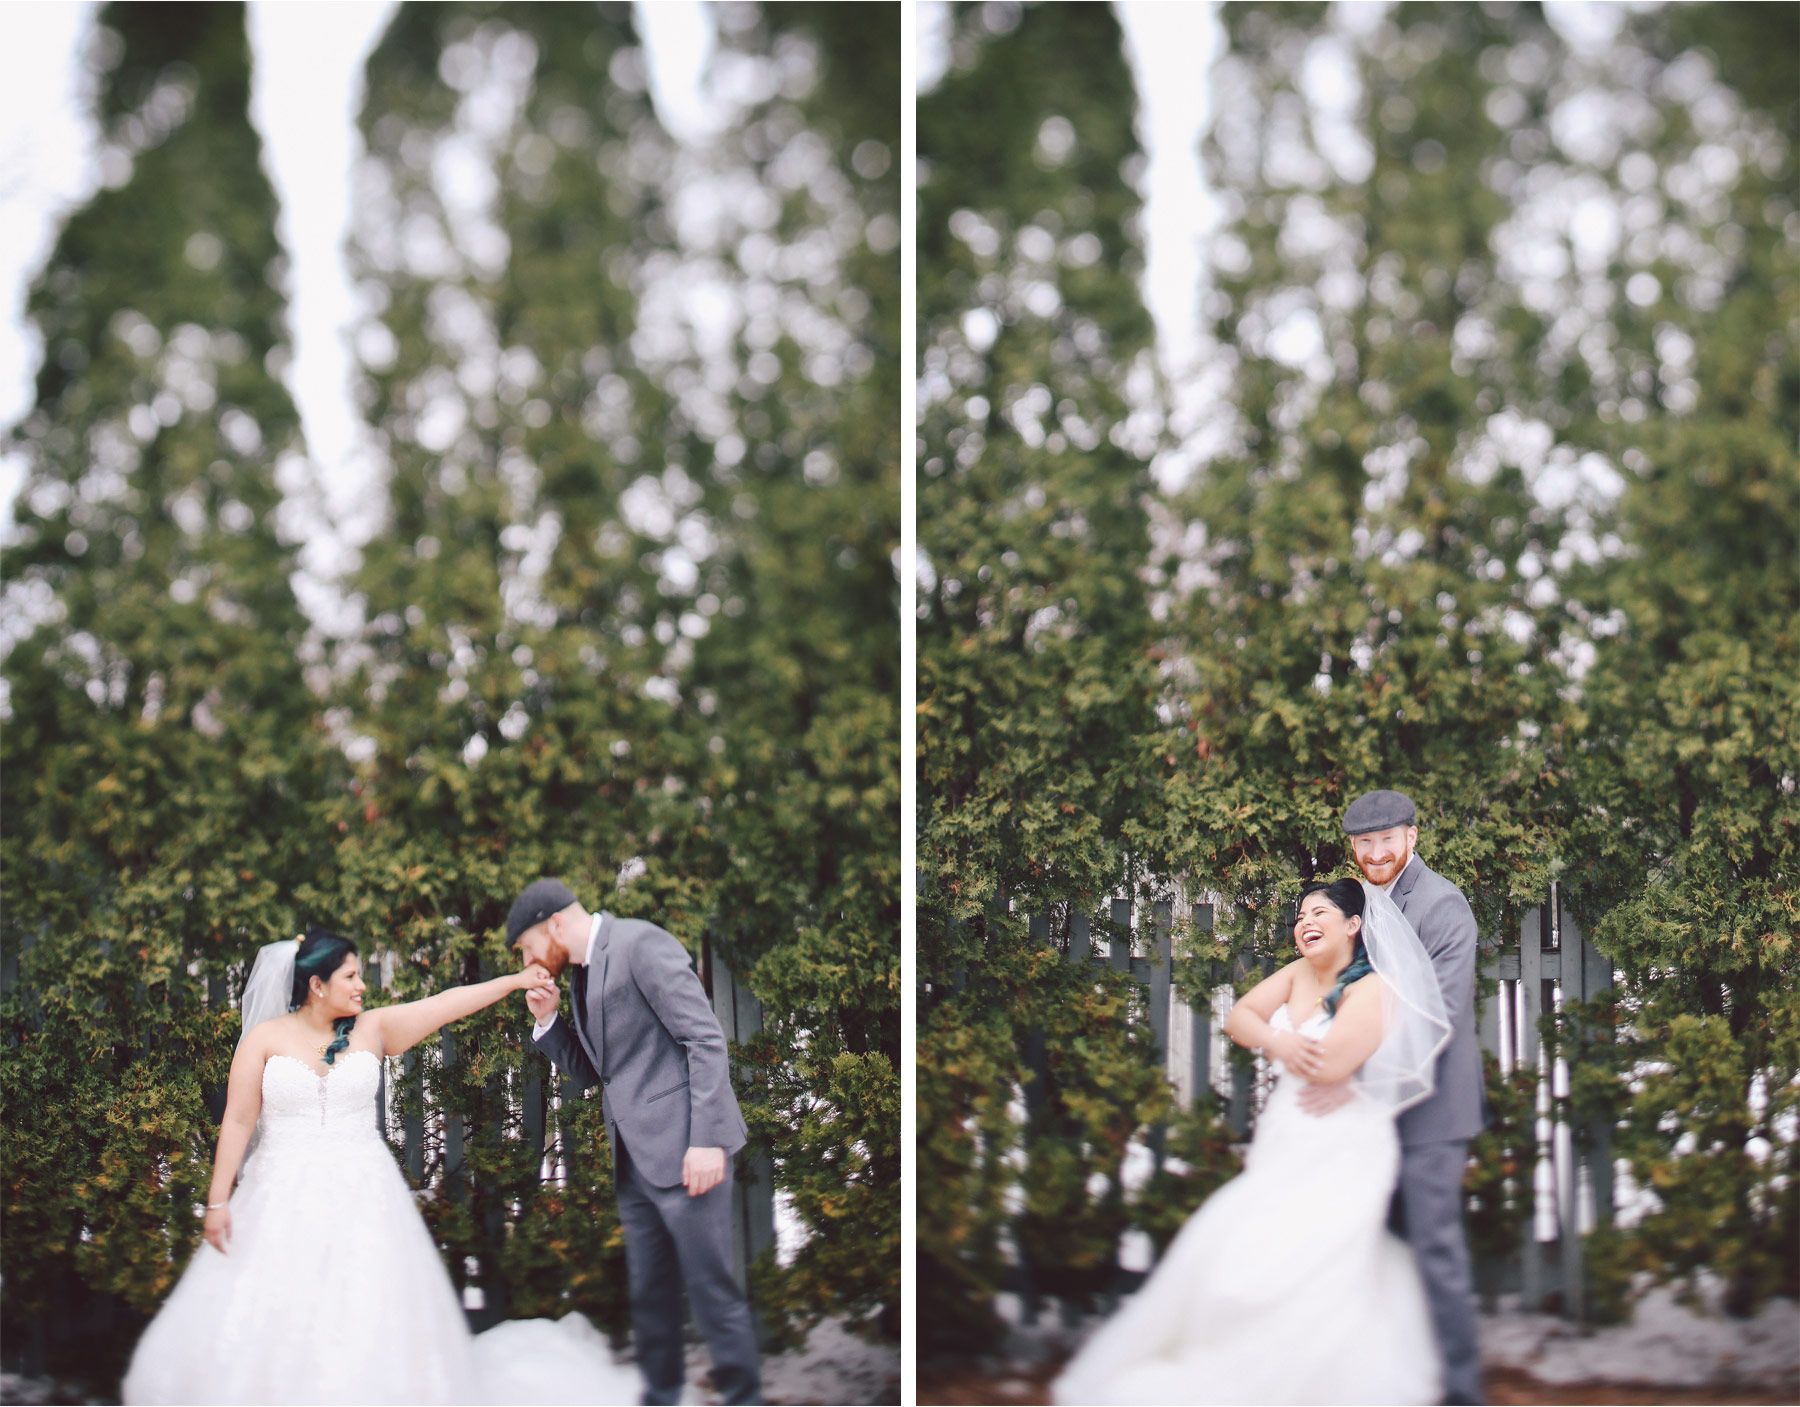 05-Saint-Paul-Minnesota-Wedding-Photography-by-Vick-Photography-Bride-Groom-Elena-and-Doug.jpg